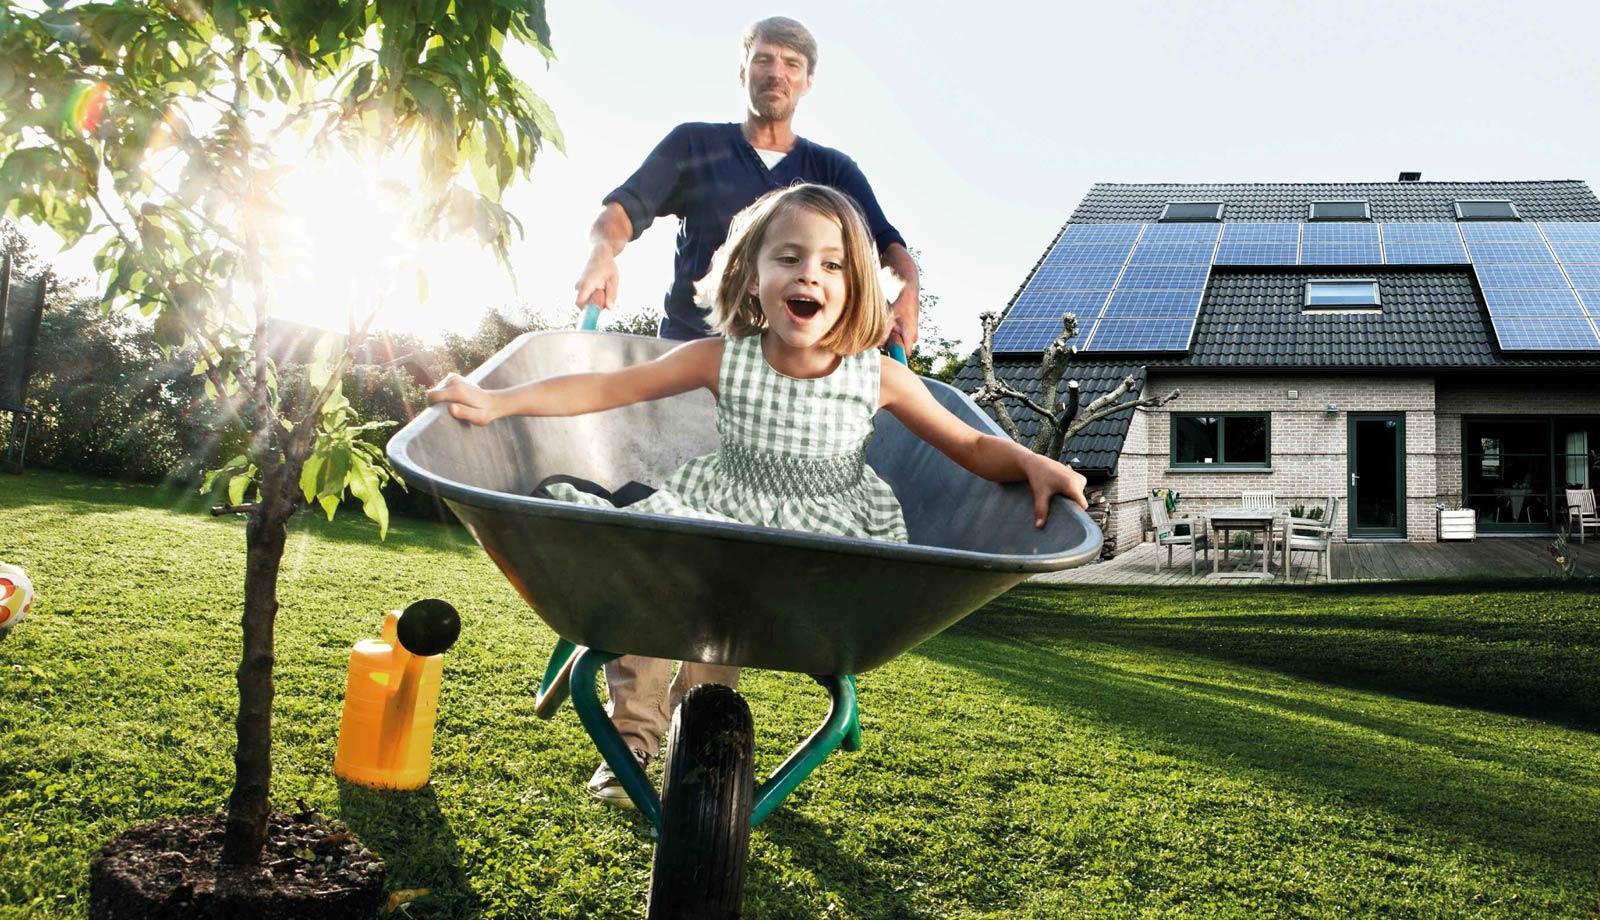 instalador fotovoltaica en pontevedra